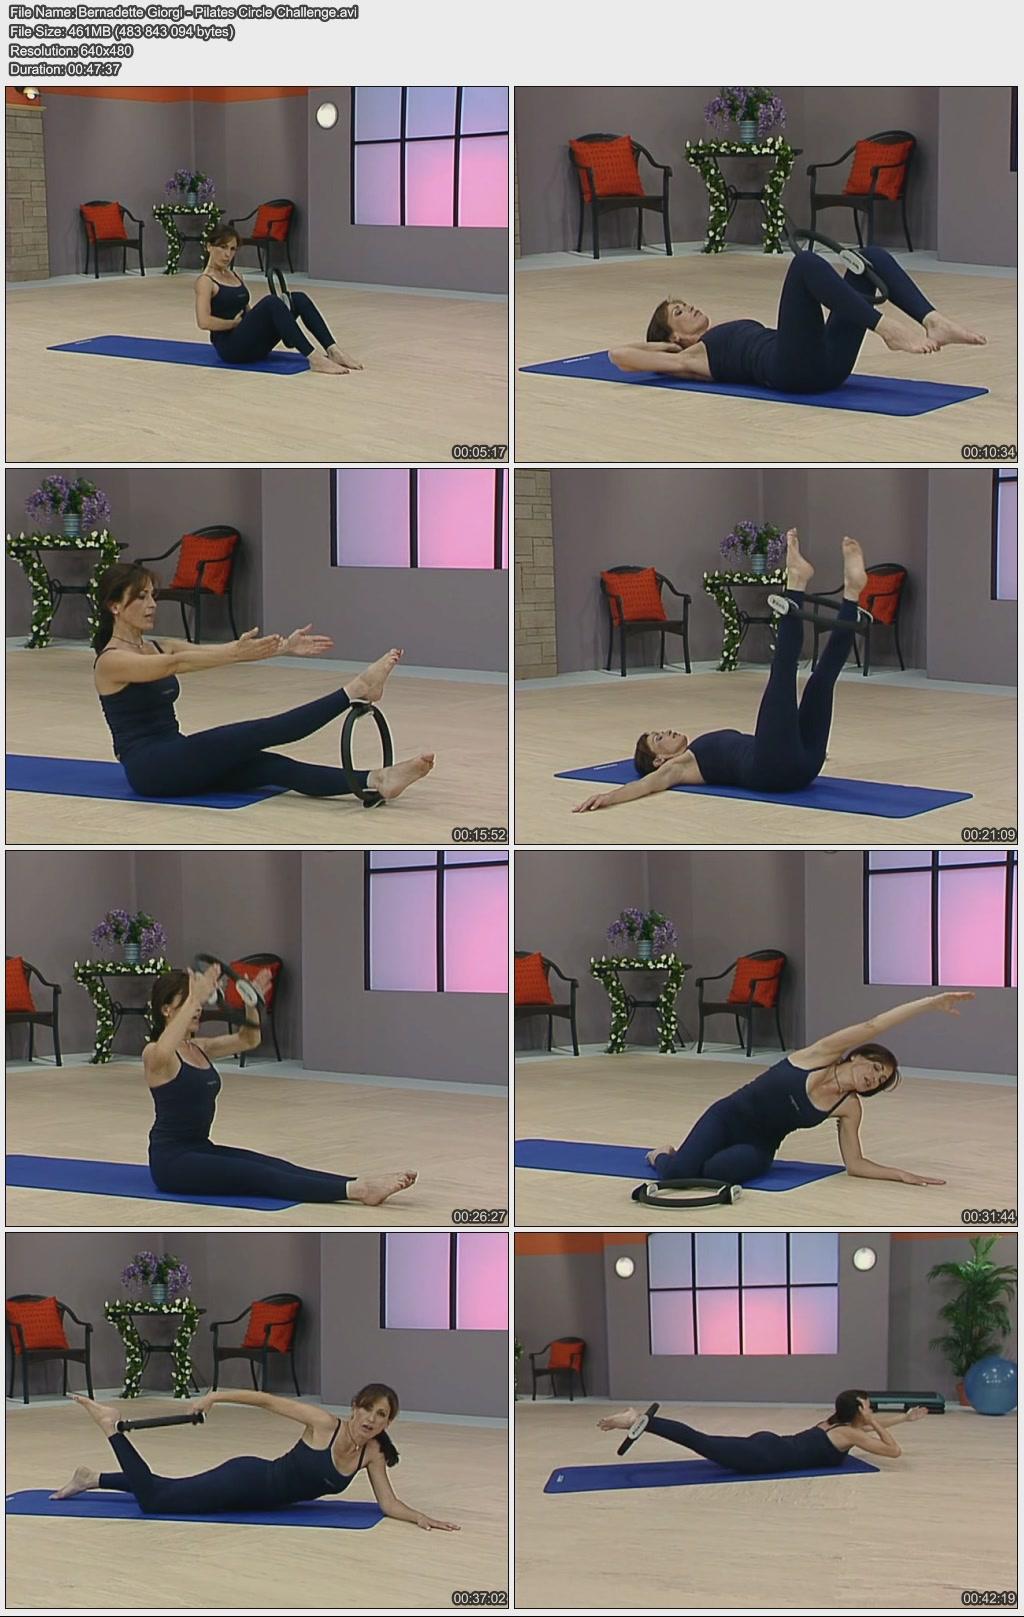 Bernadette Giorgi - Just b Method - Pilates Circle Mat Challenge